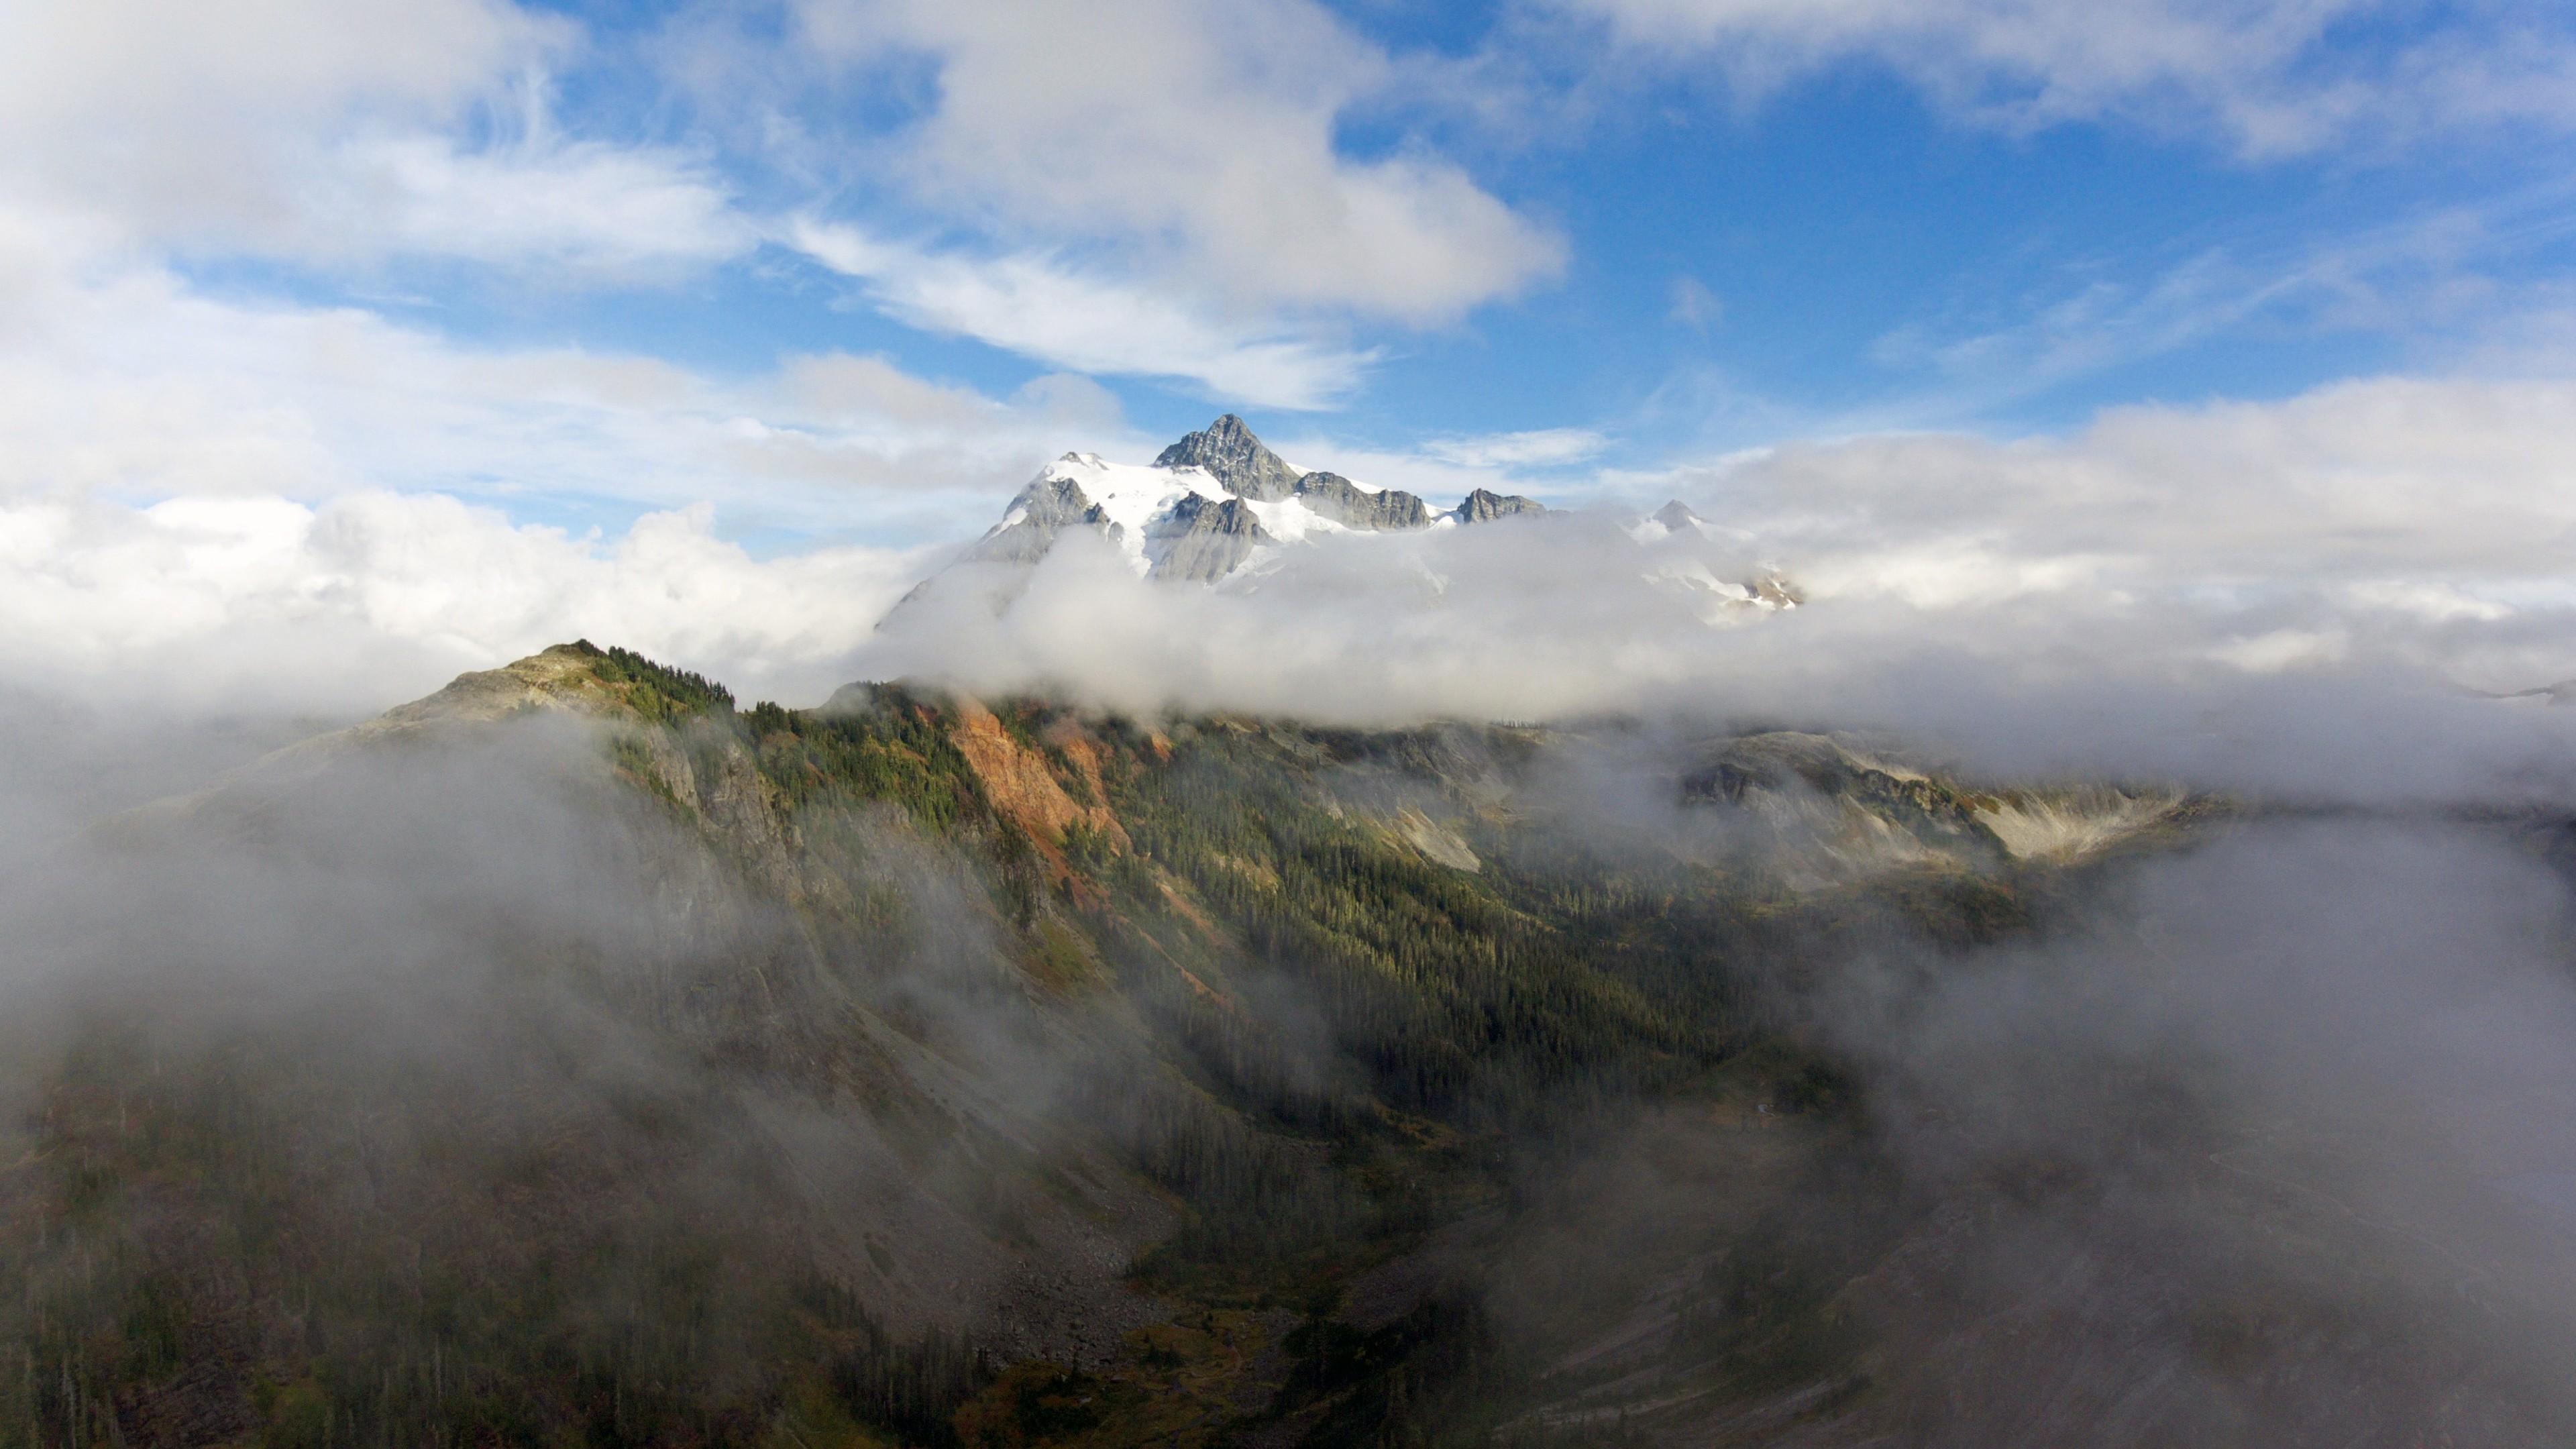 Wallpaper mountains 5k 4k wallpaper forest clouds Nature 12598 3840x2160